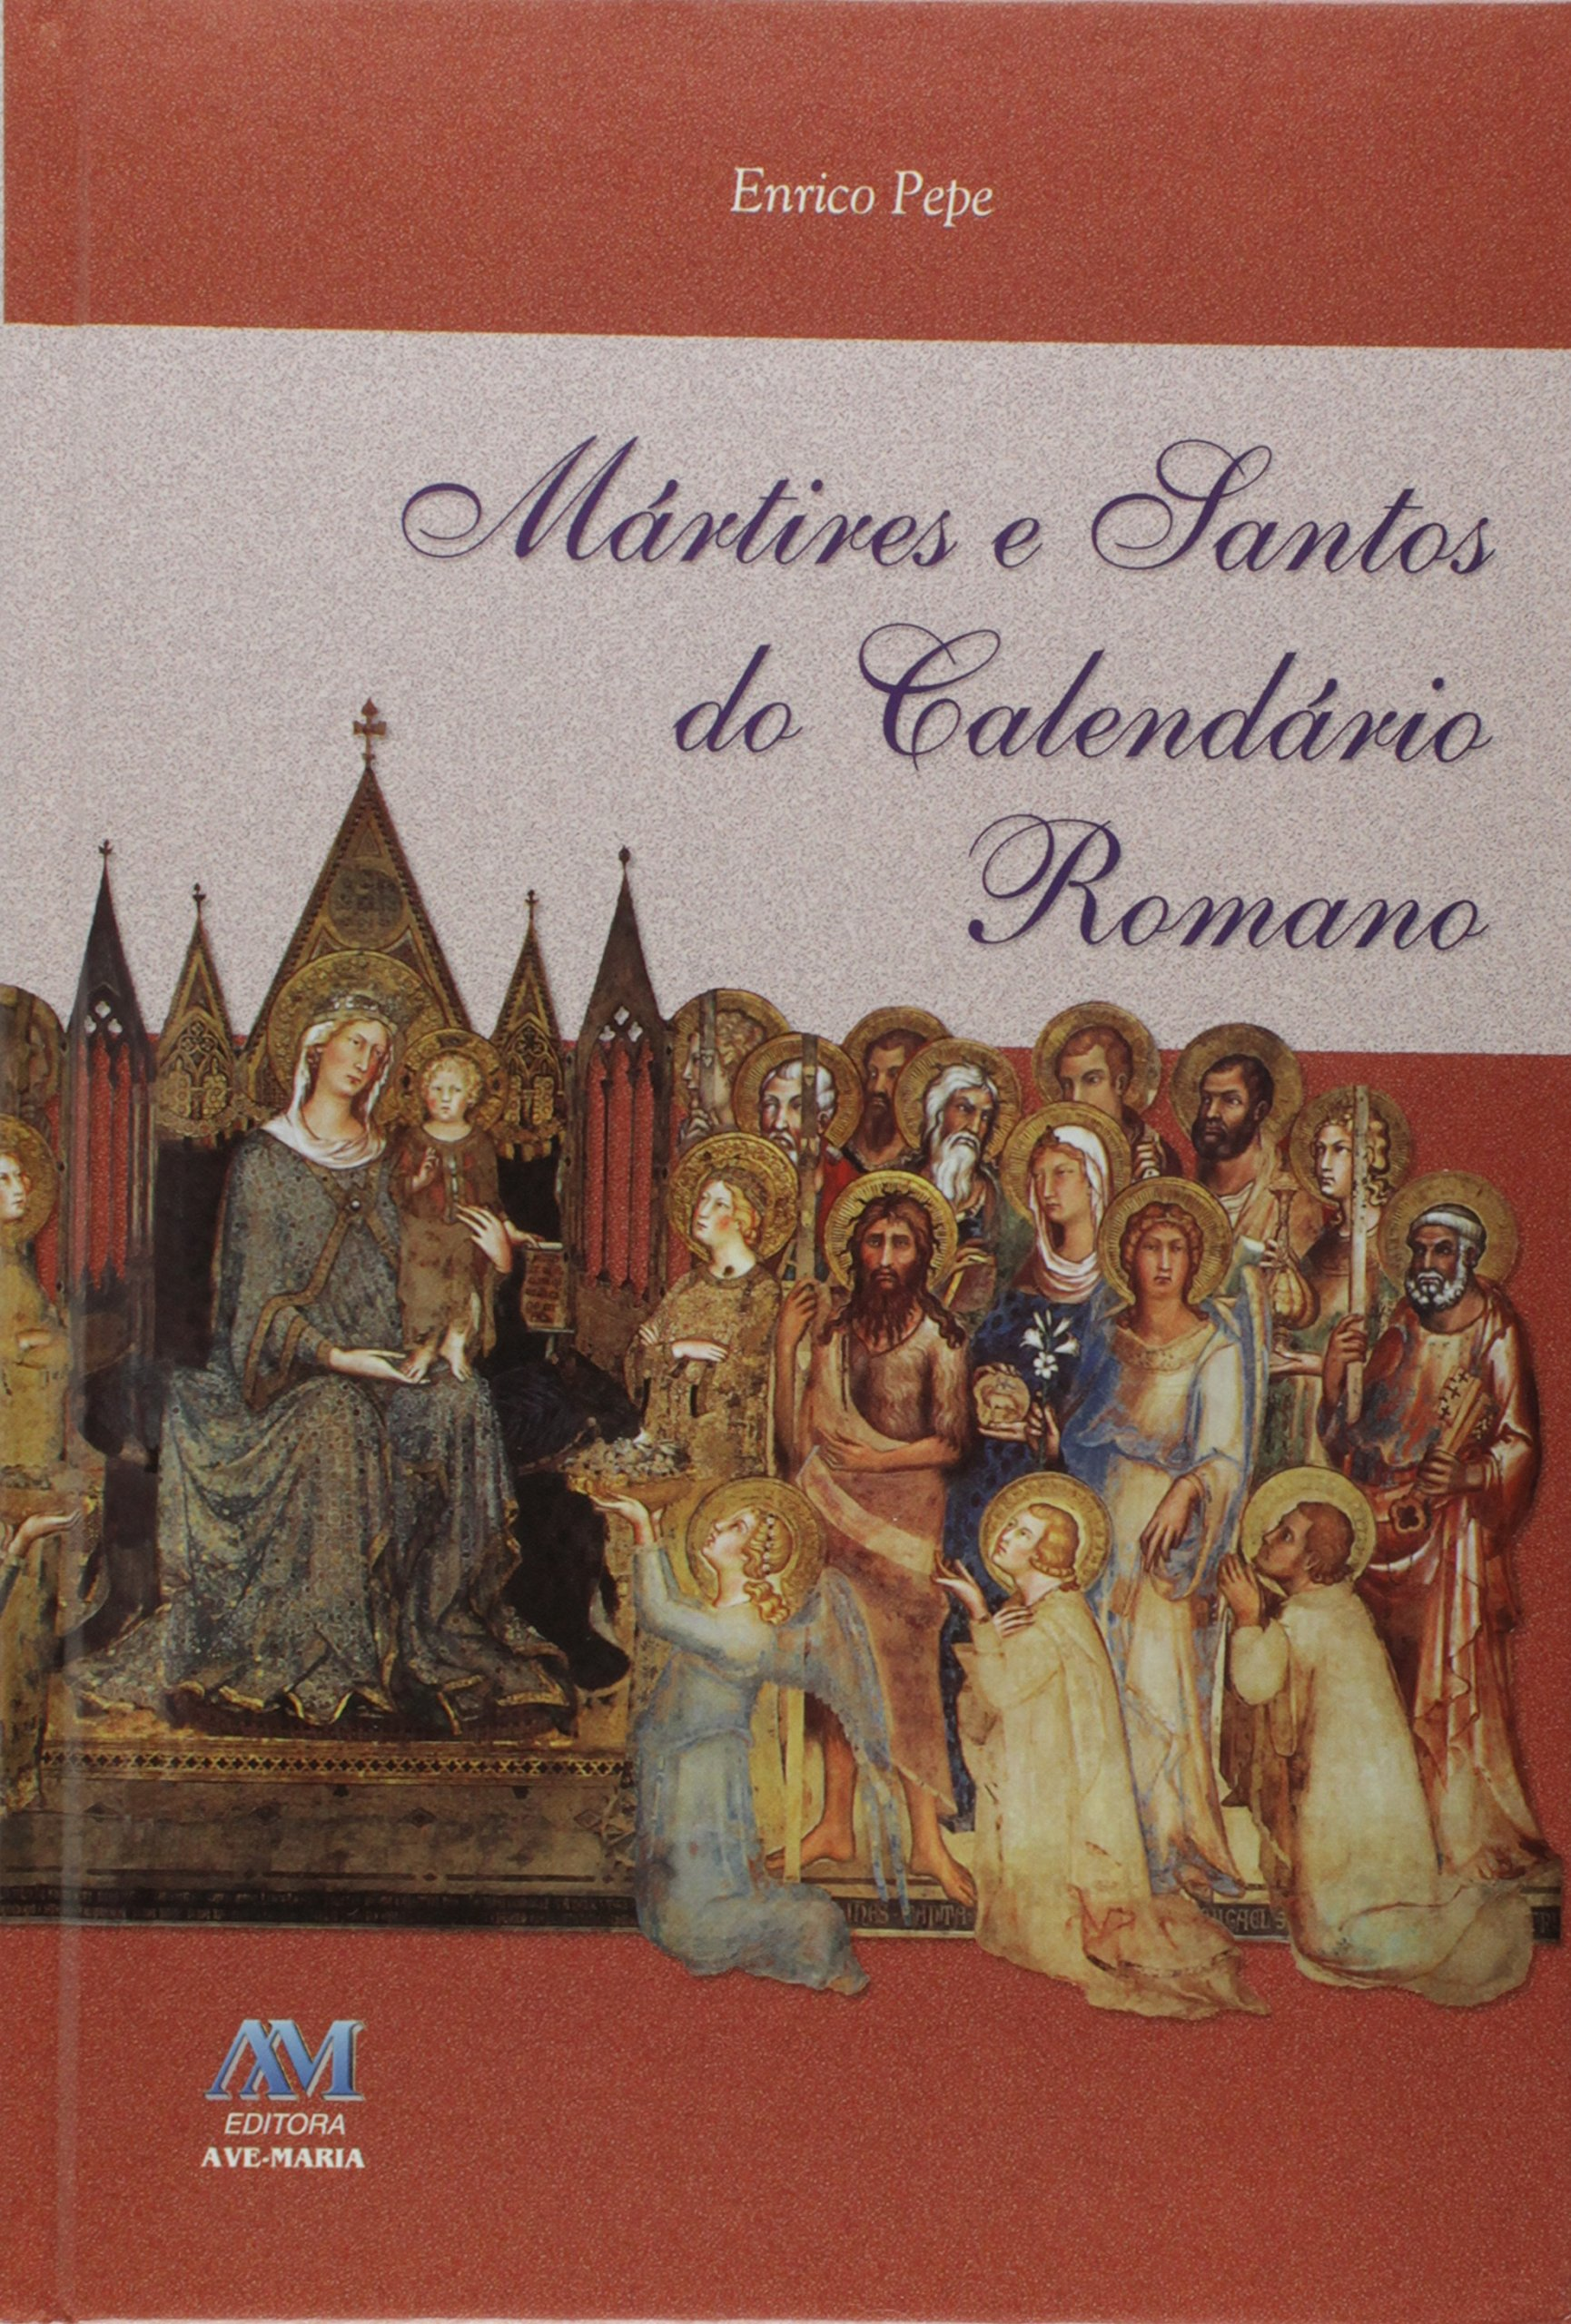 Calendario Romano.Martires E Santos Do Calendario Romano Em Portuguese Do Brasil